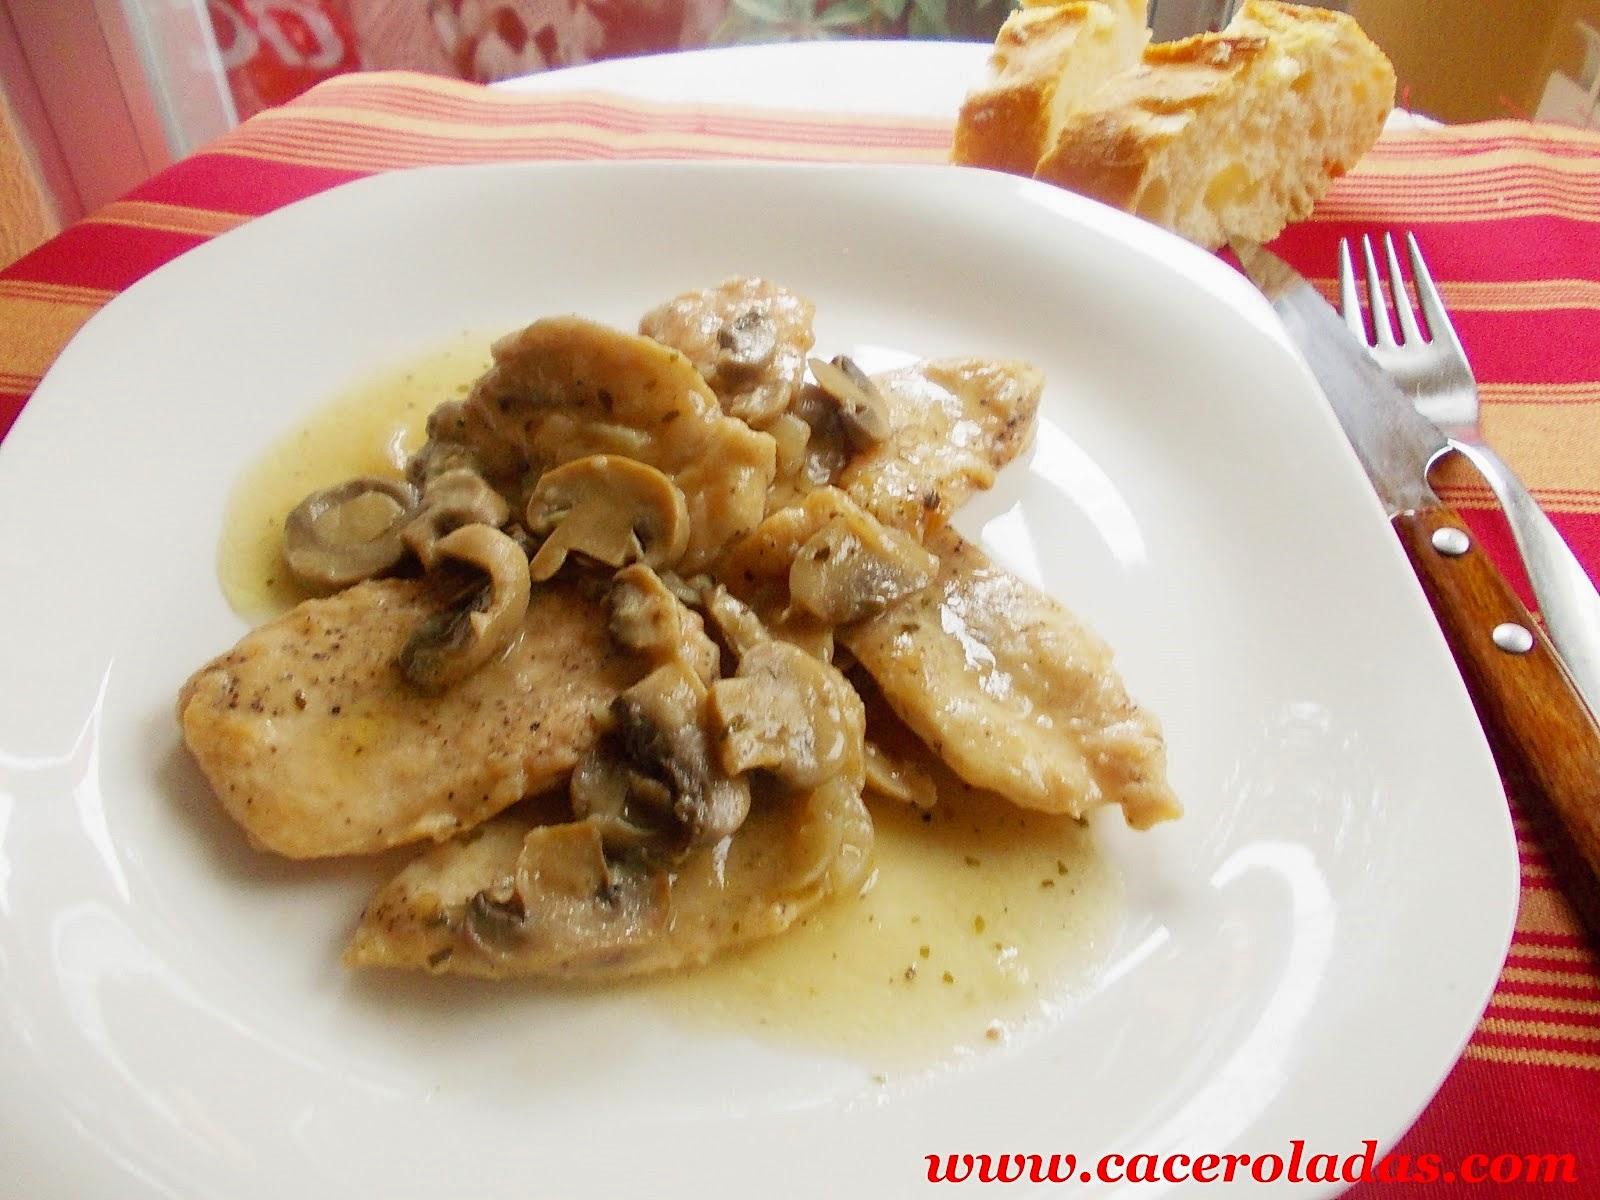 Filetes de Pollo en Salsa de Champiñones Filetes de Pollo en Salsa Con